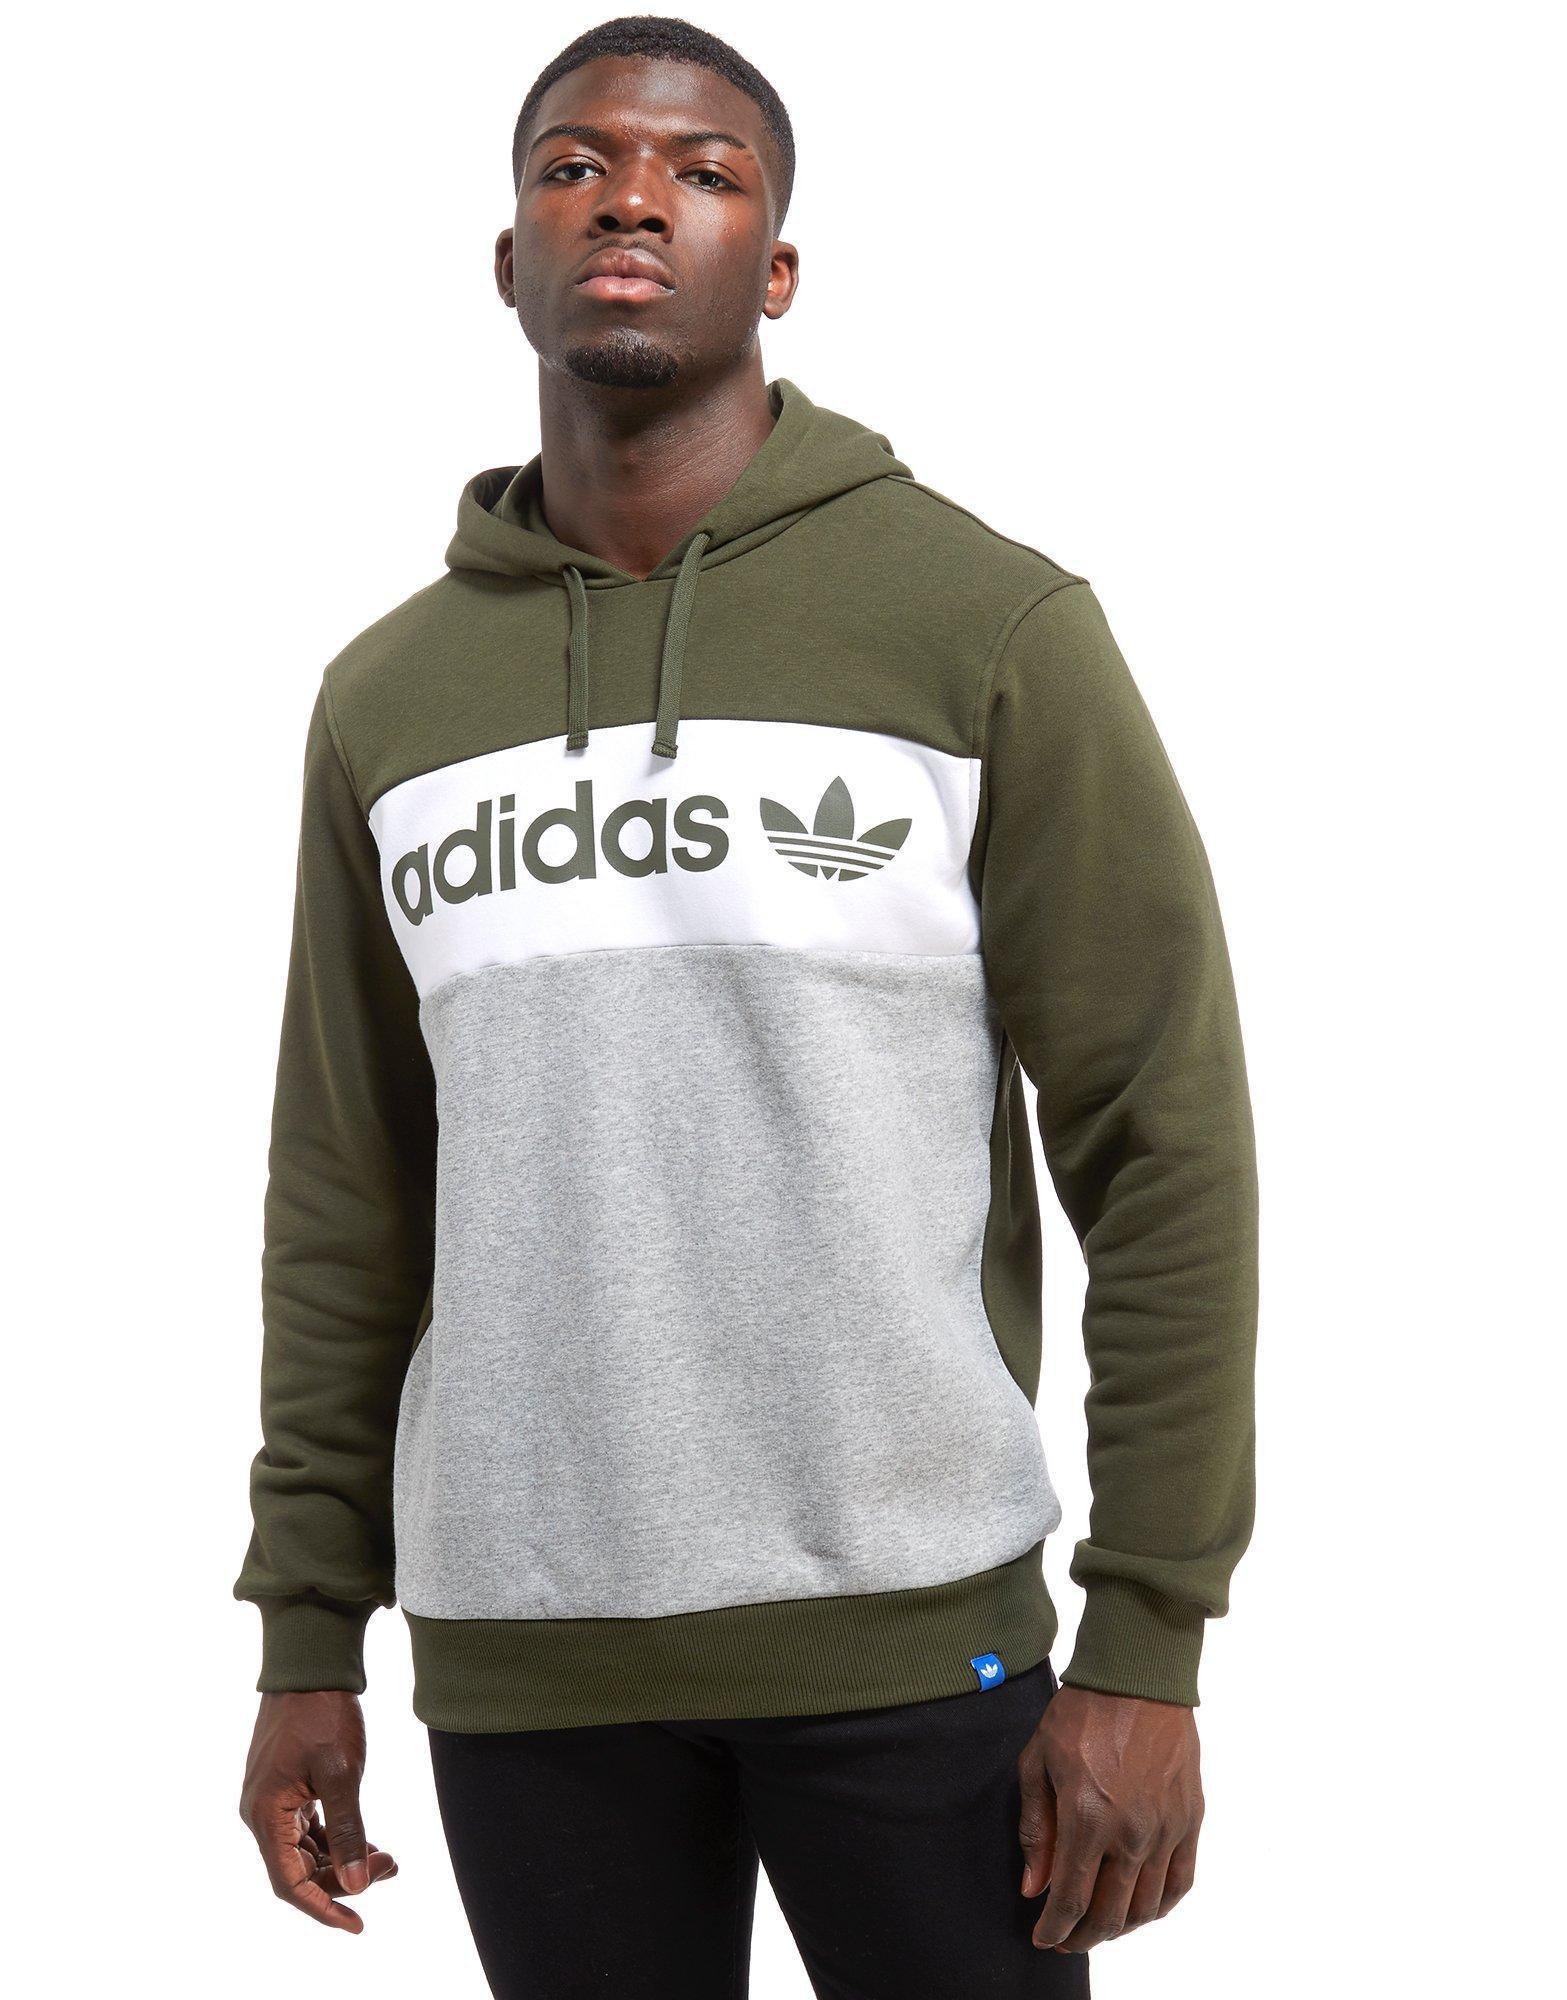 adidas Originals Cotton Linear Colour Block Hoodie in Green